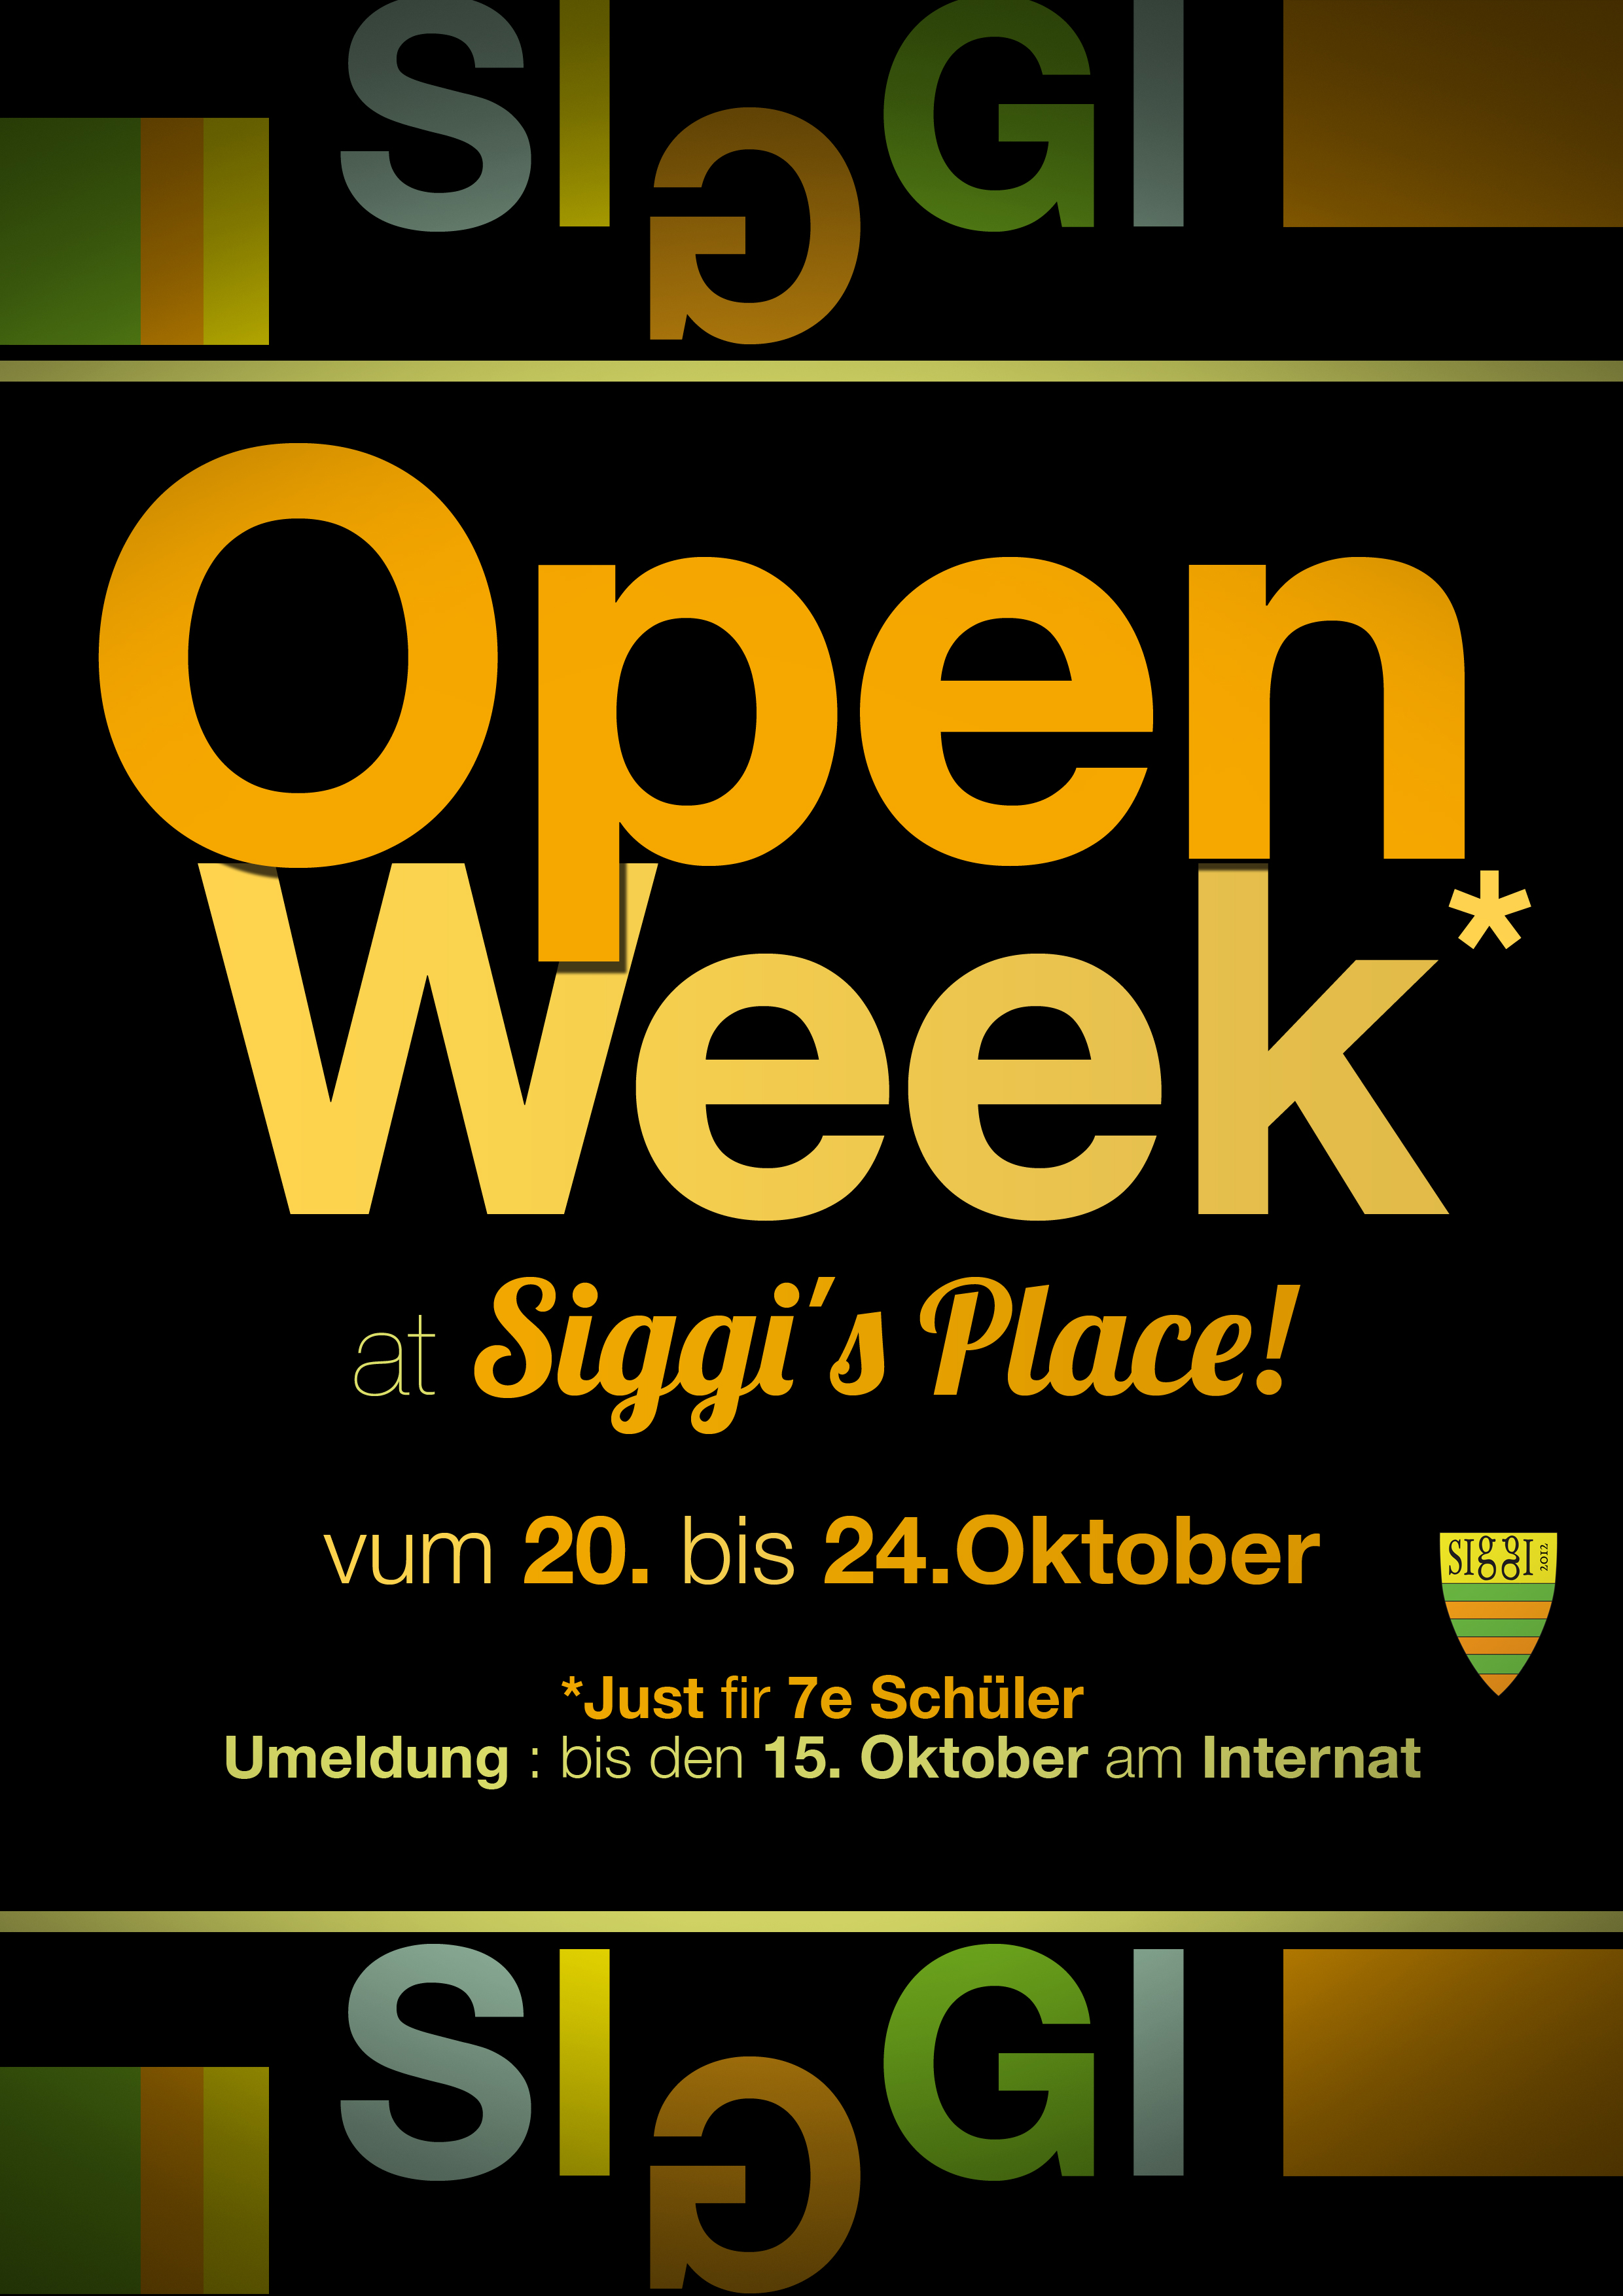 2014 siggi_open week2.jpg